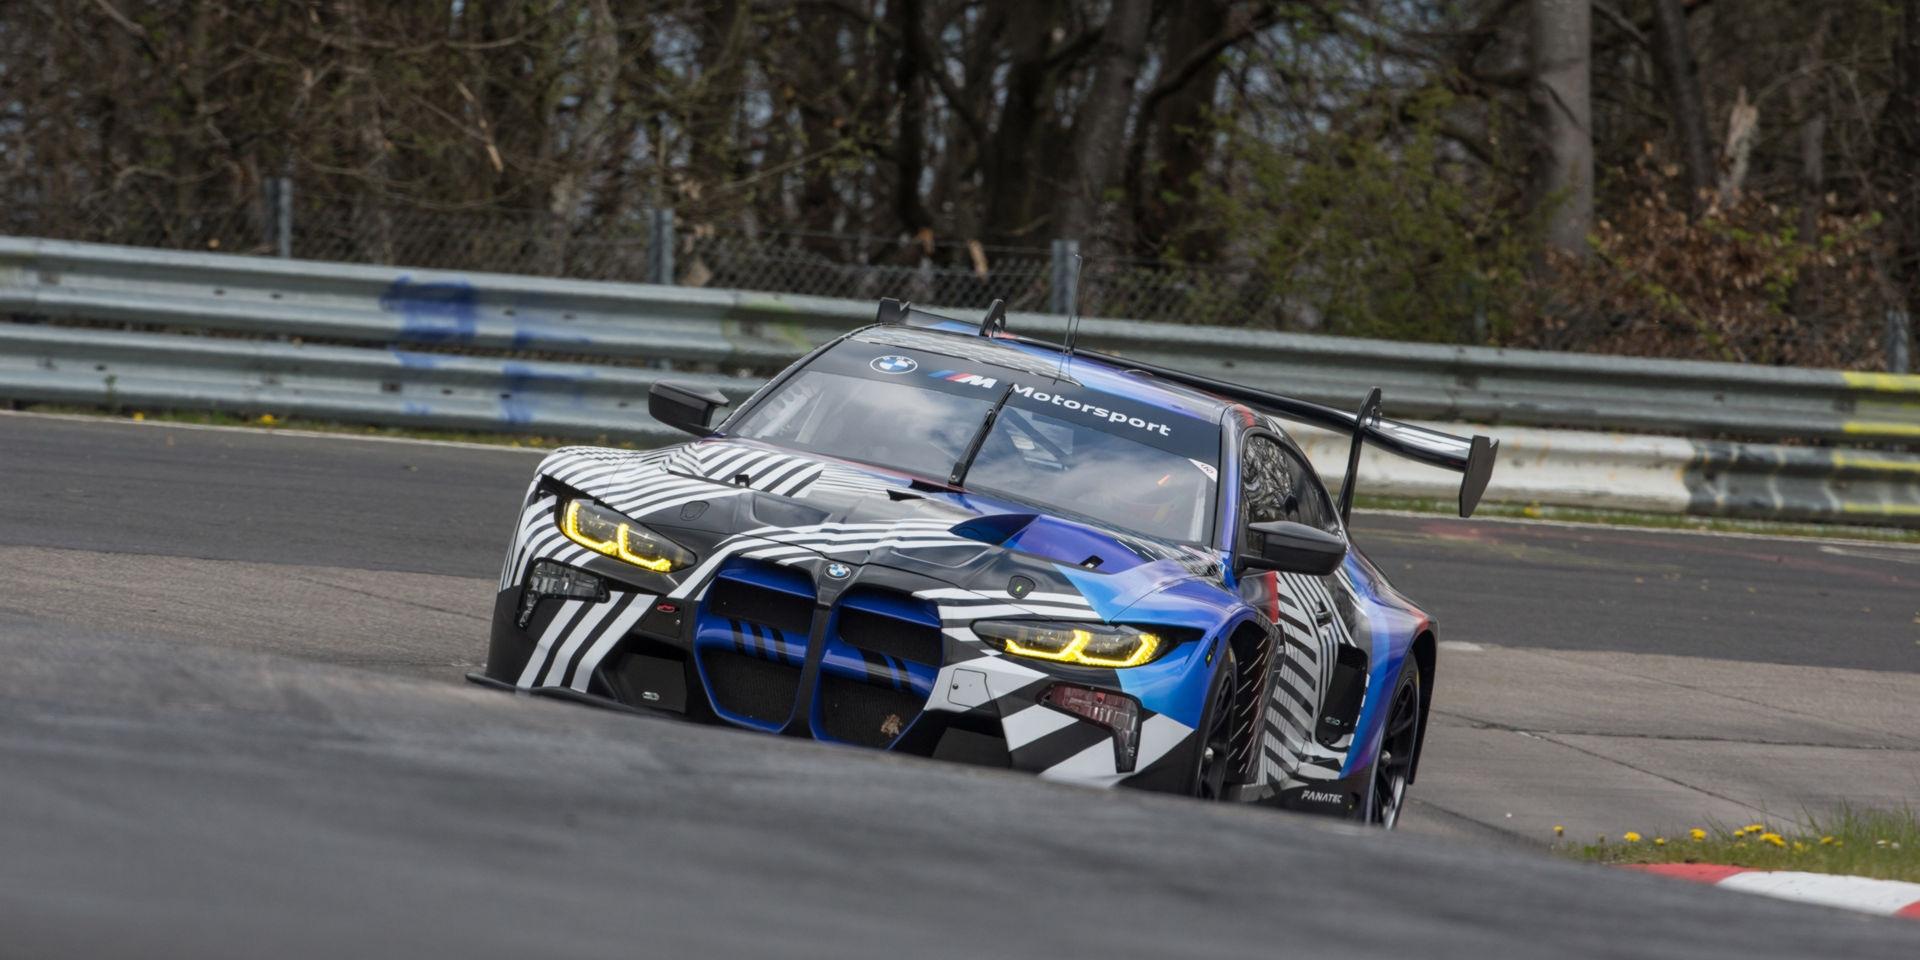 BMW全新賽車M4 GT3將取代M6 GT3,積極進行測試中